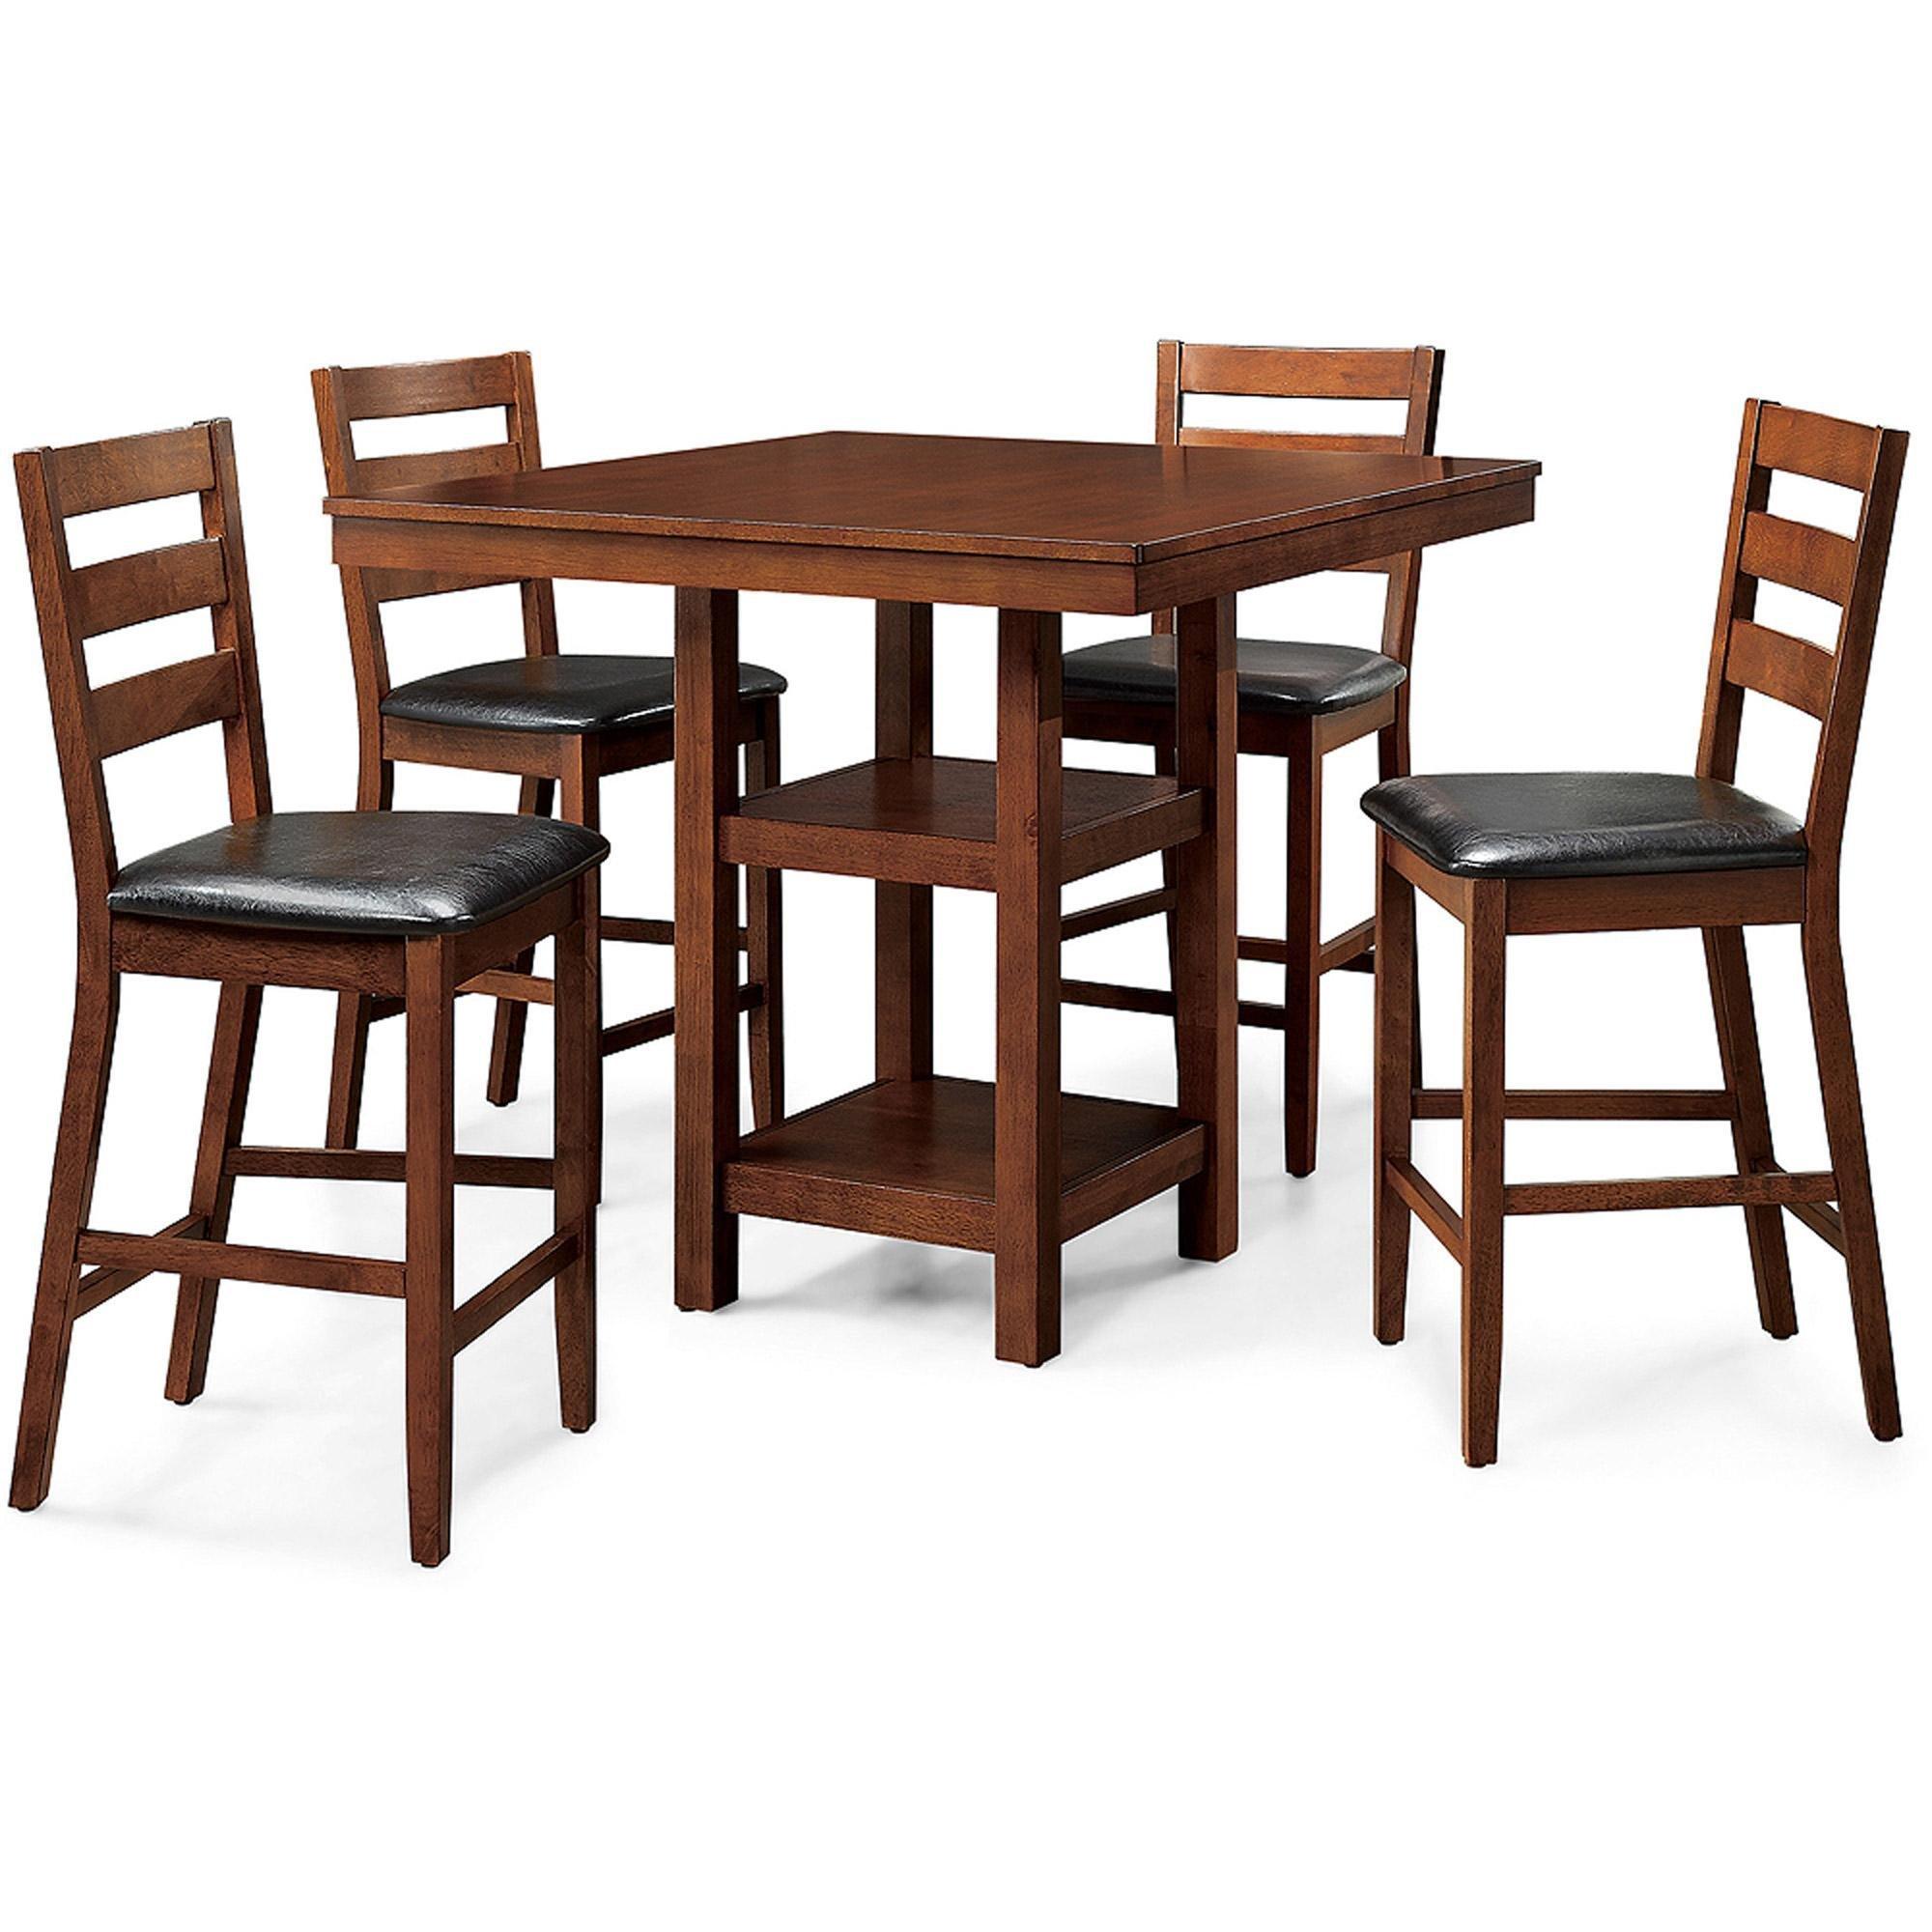 New - Dalton Park 5-Piece Counter Height Dining Set, Mocha